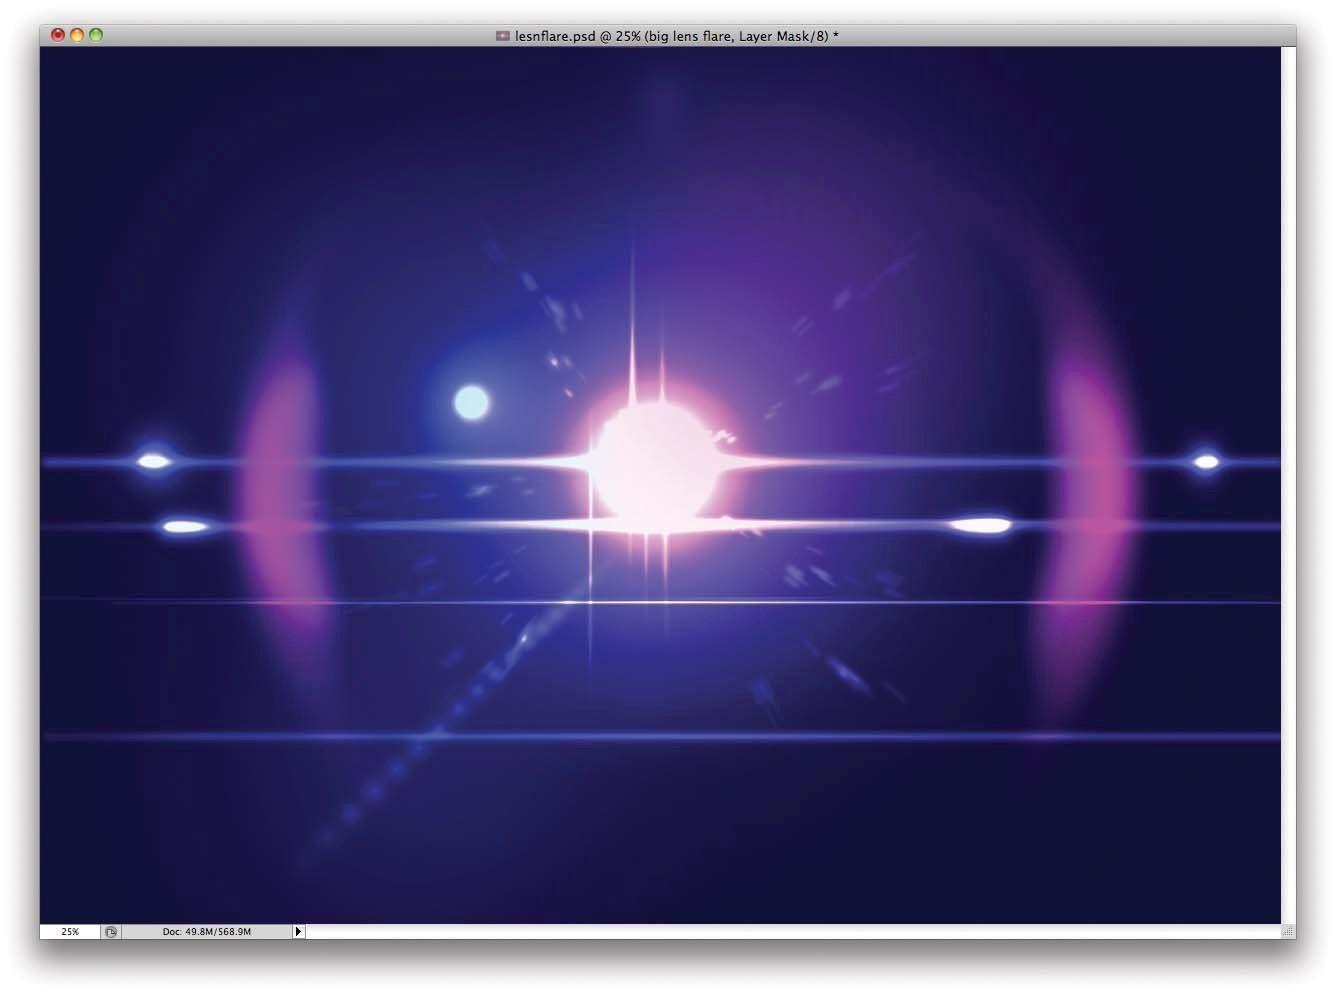 Line Art Effect Photoshop Tutorial : Photoshop tutorial: create lens flares that aren't cheesy